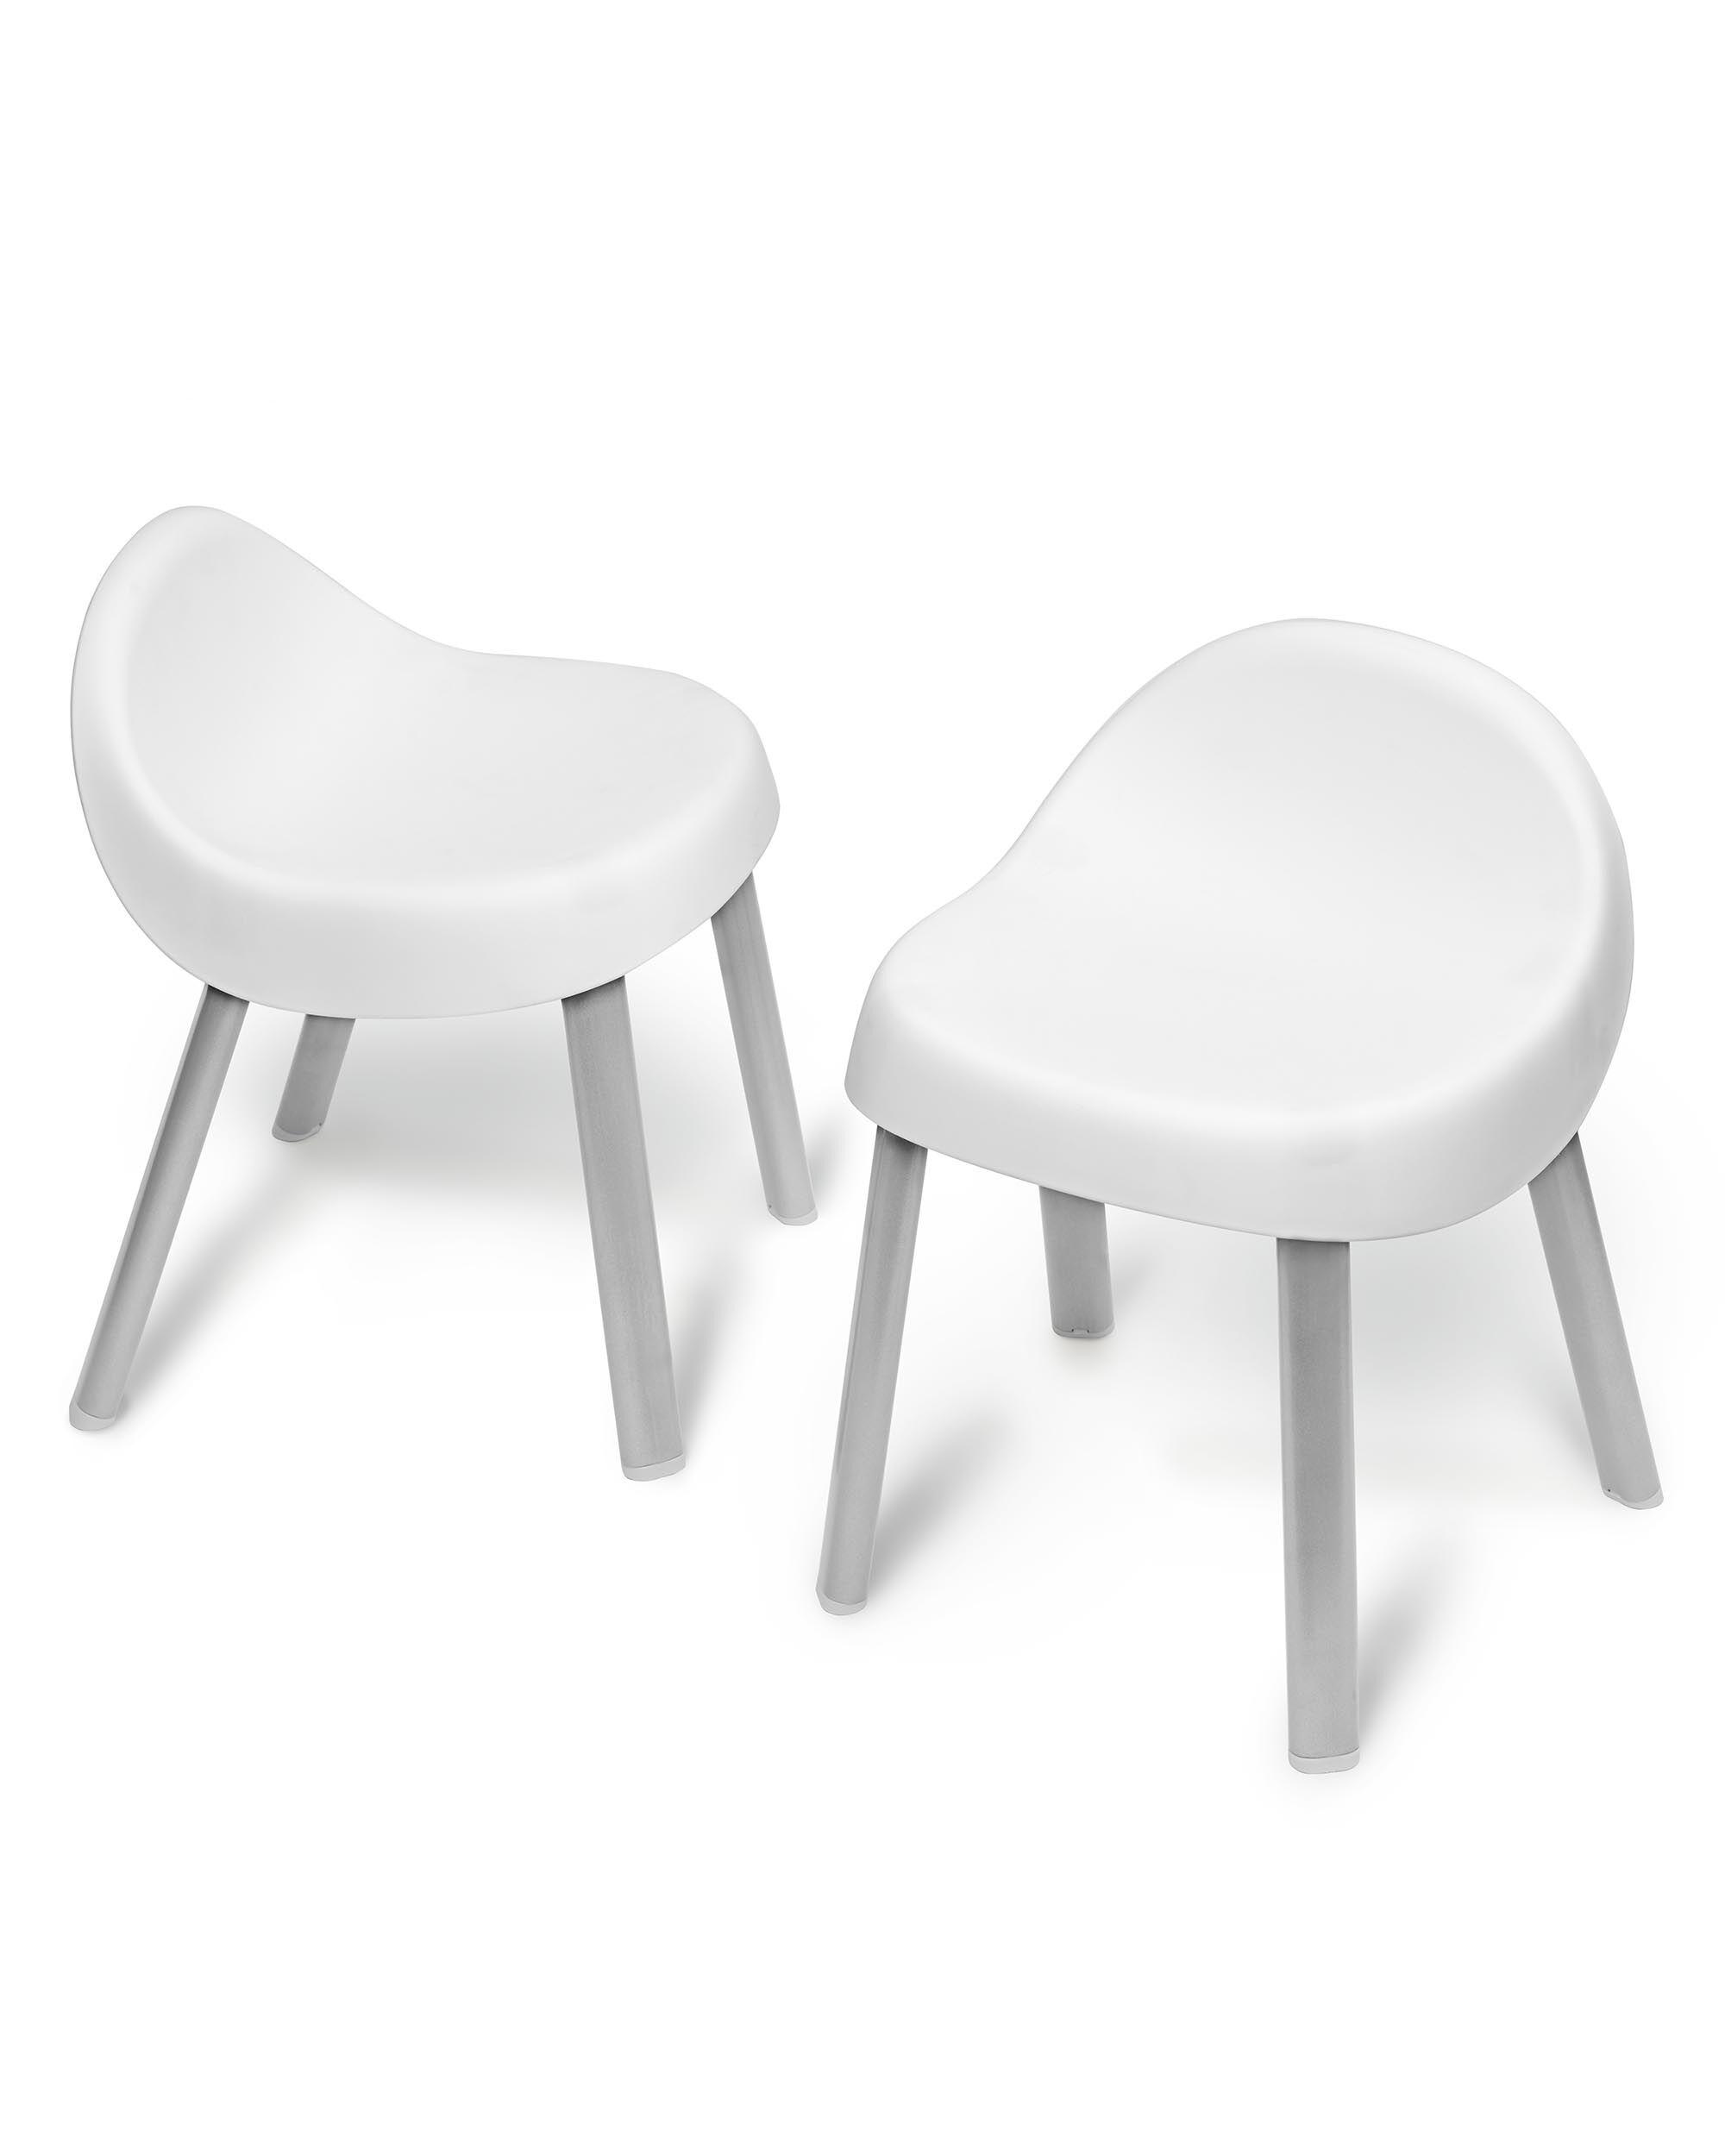 Superbe Explore U0026 More Kids Chairs